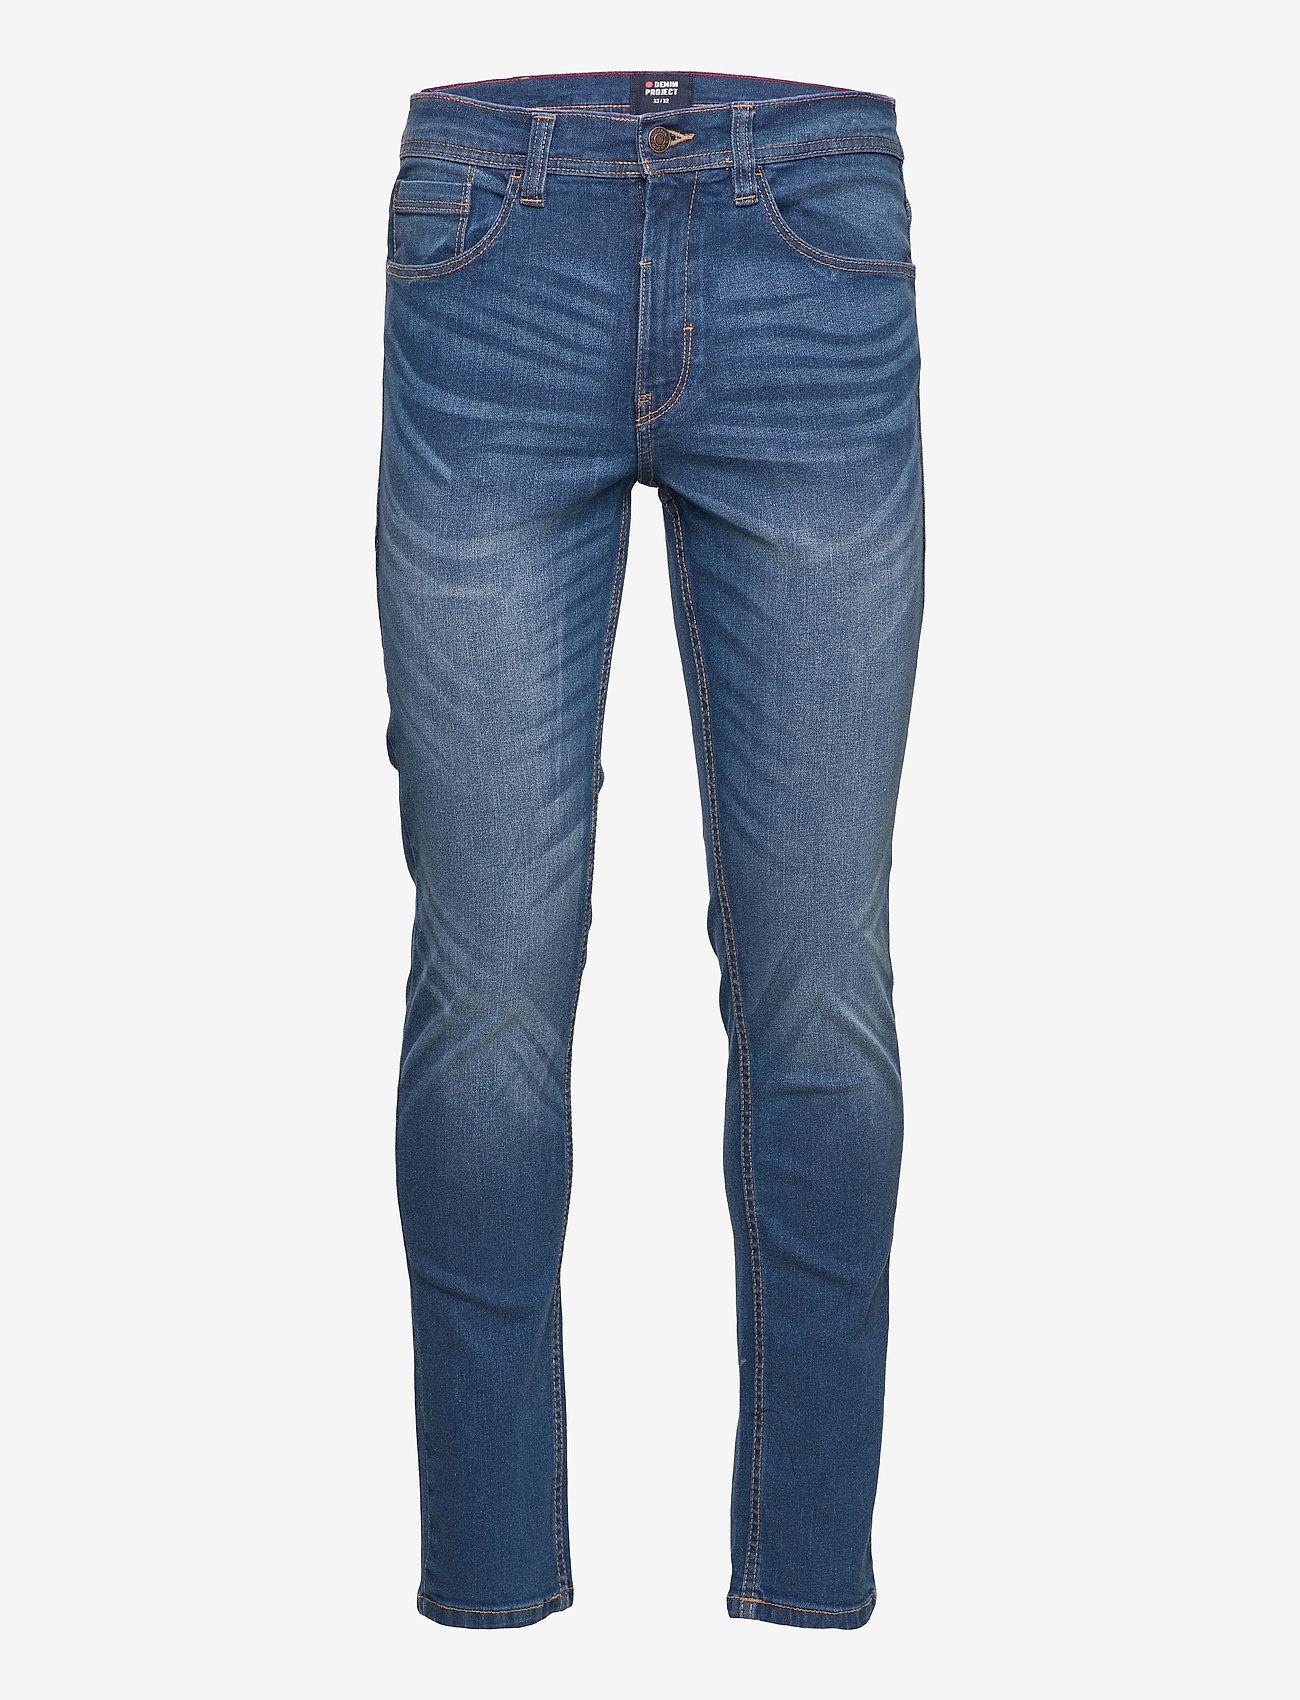 Denim project - Dptom jeans - slim jeans - 110 medium blue - 0